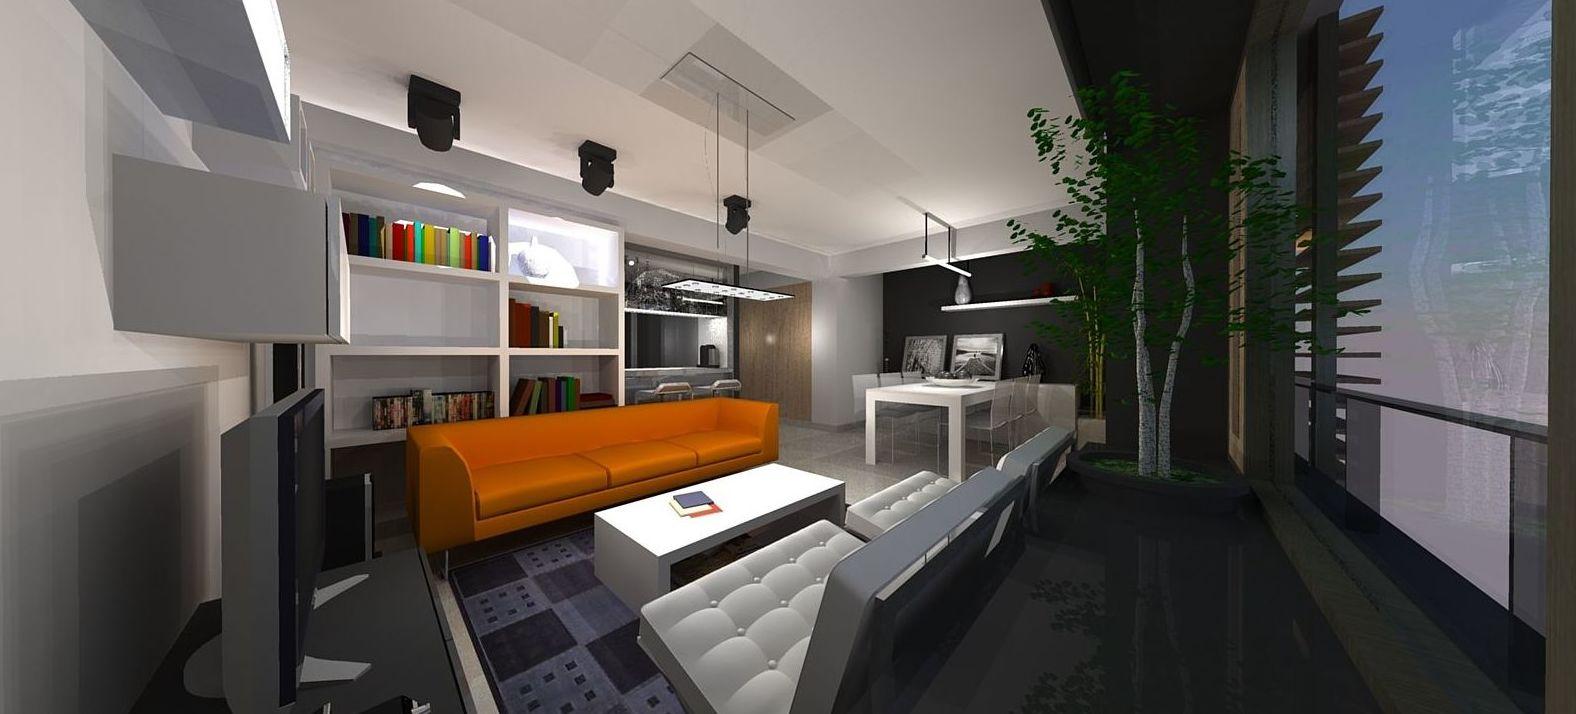 Diseño de vivienda en Lima